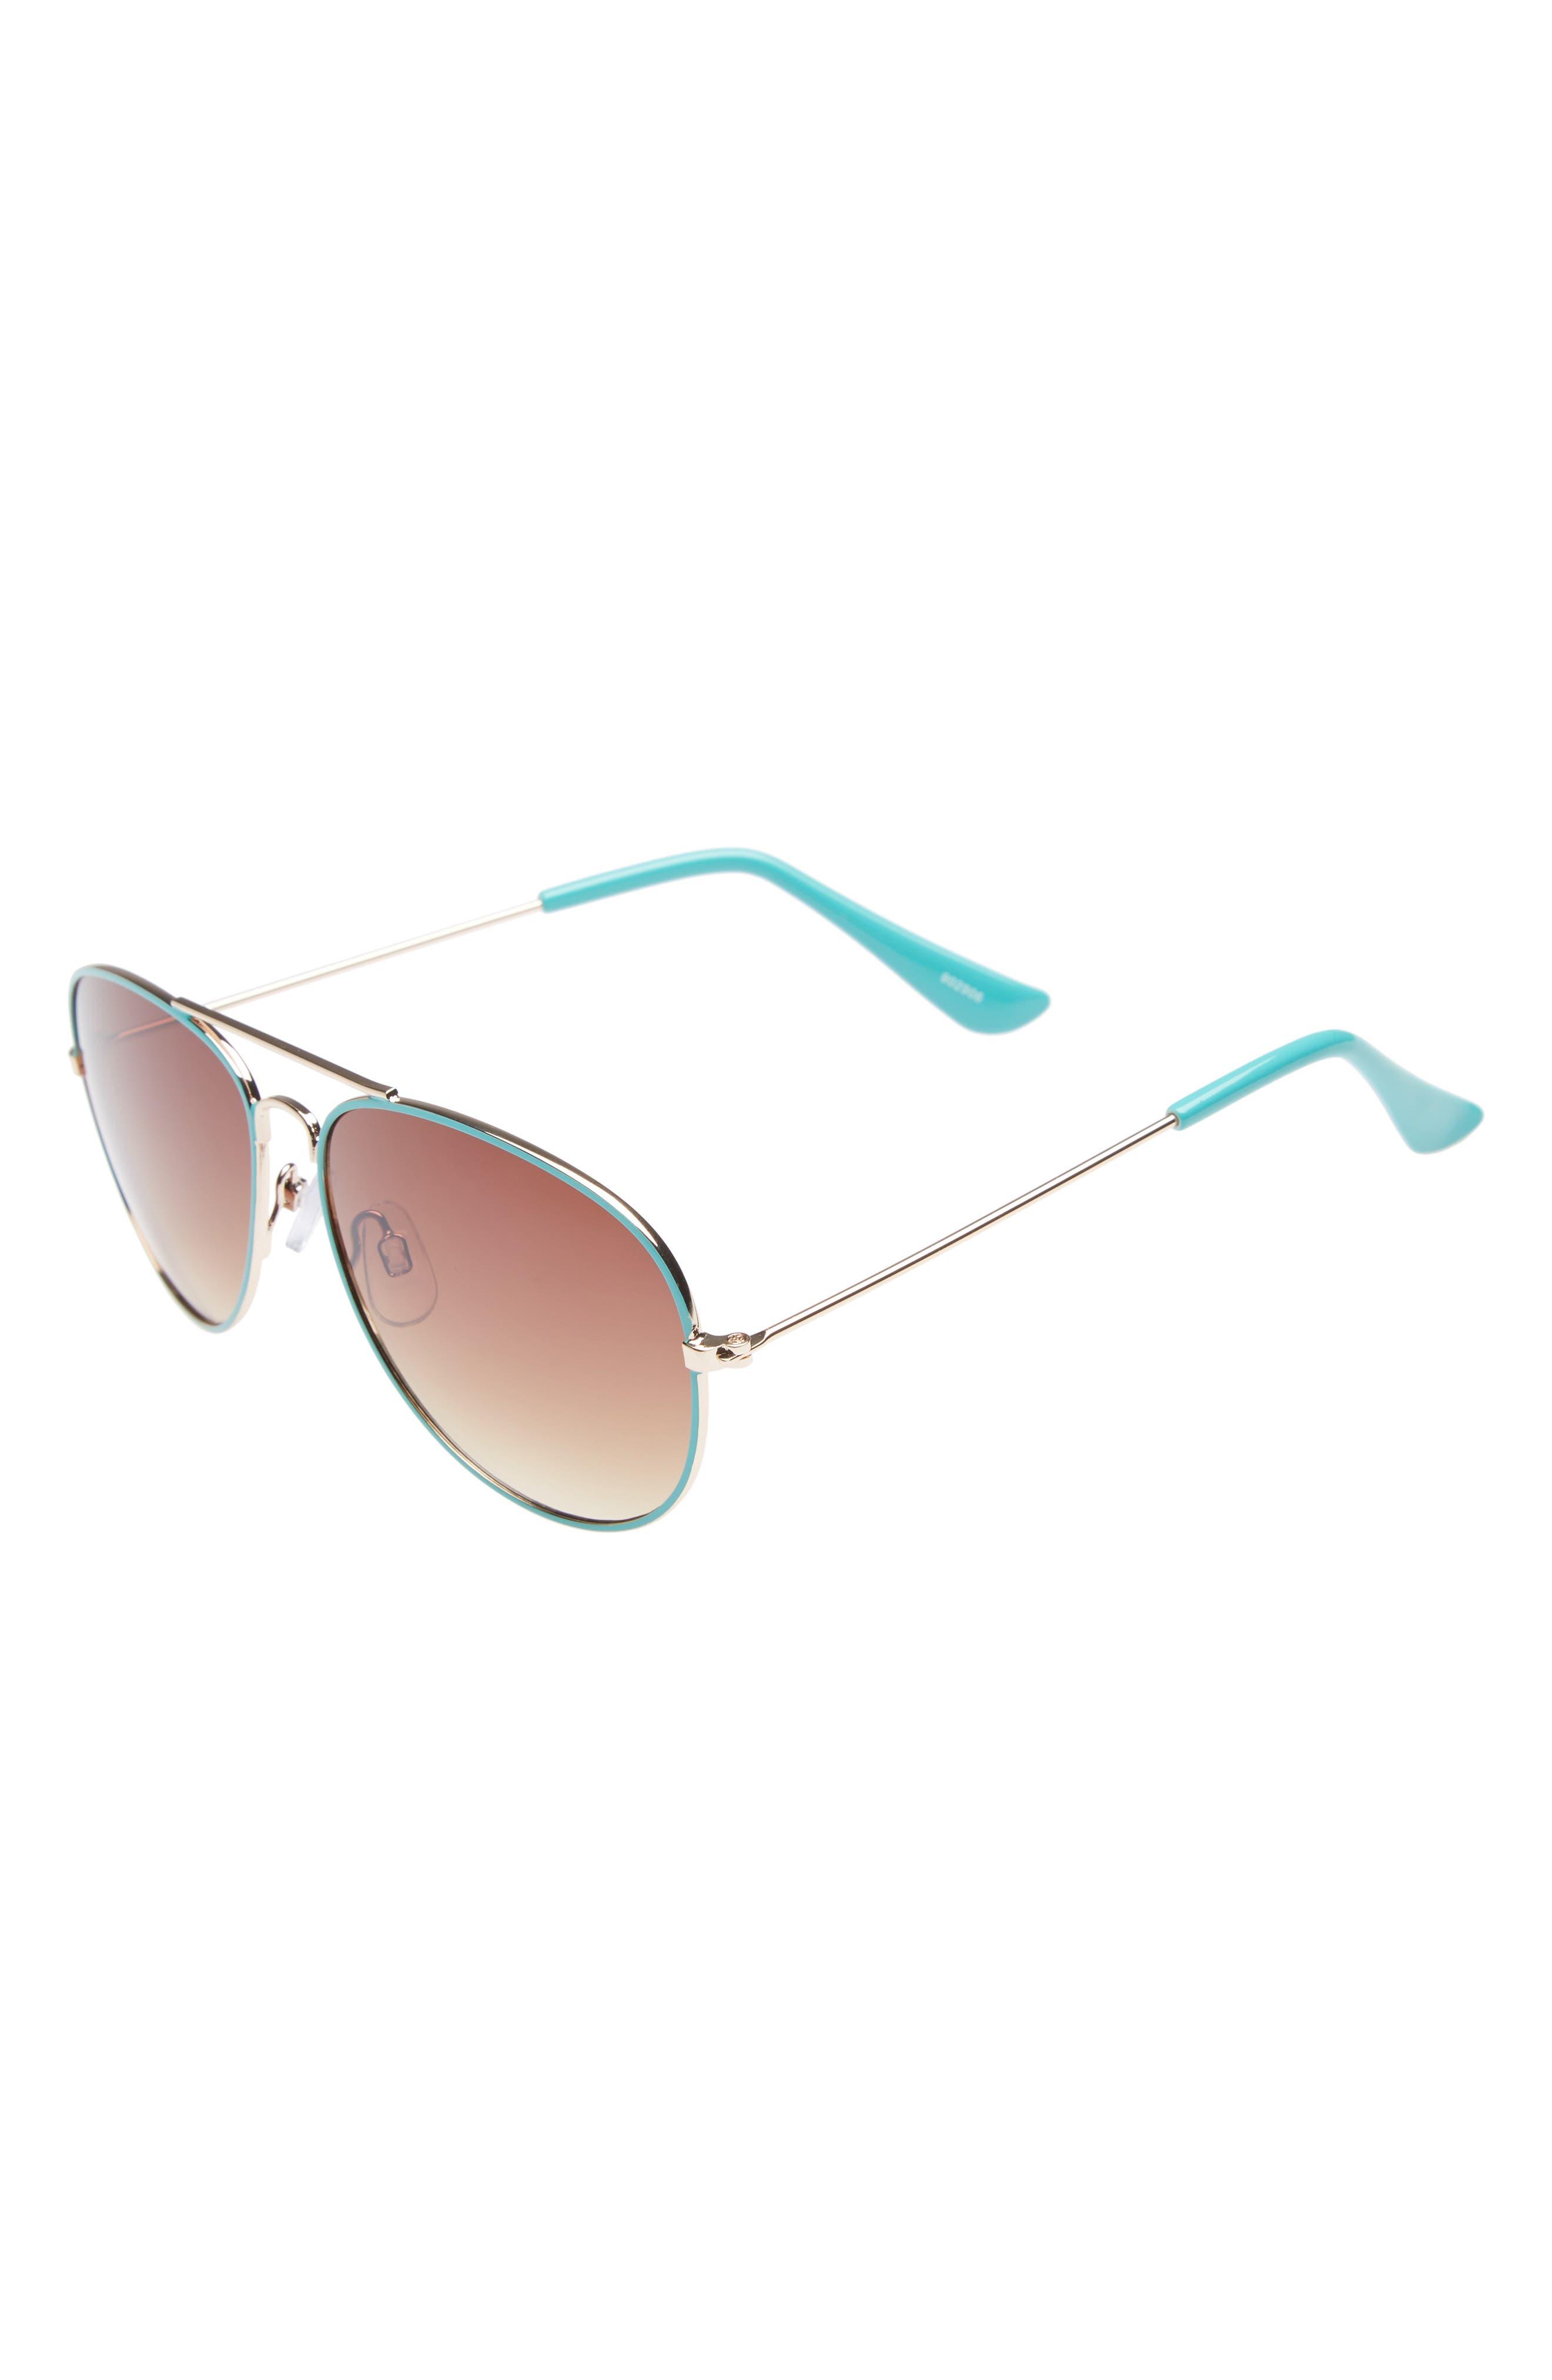 Aviator Sunglasses,                             Main thumbnail 1, color,                             710